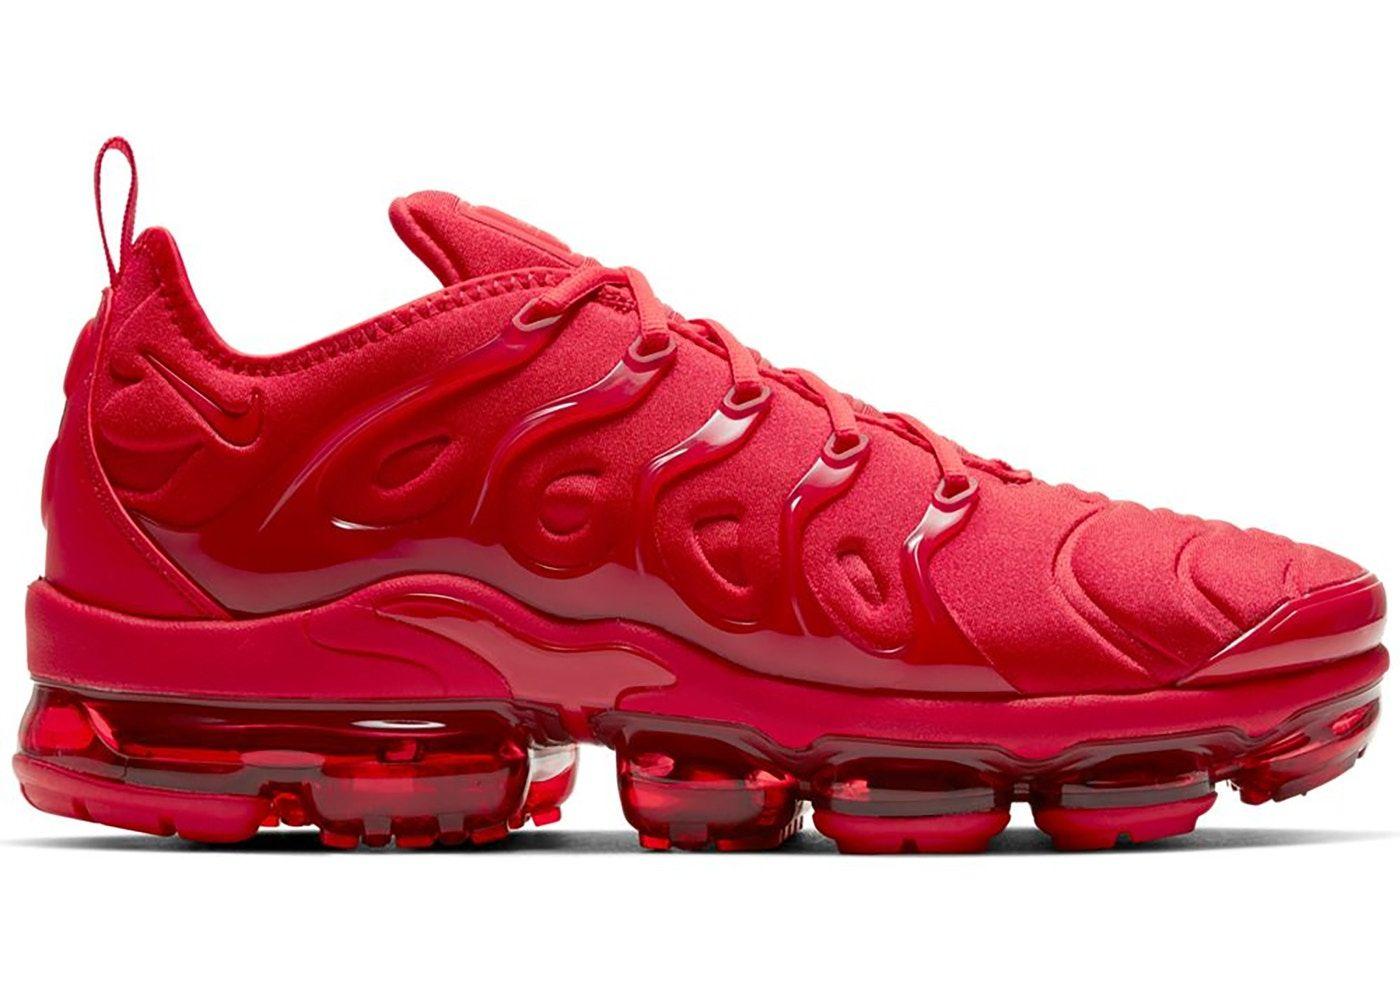 Nike Air VaporMax Plus Triple Red in